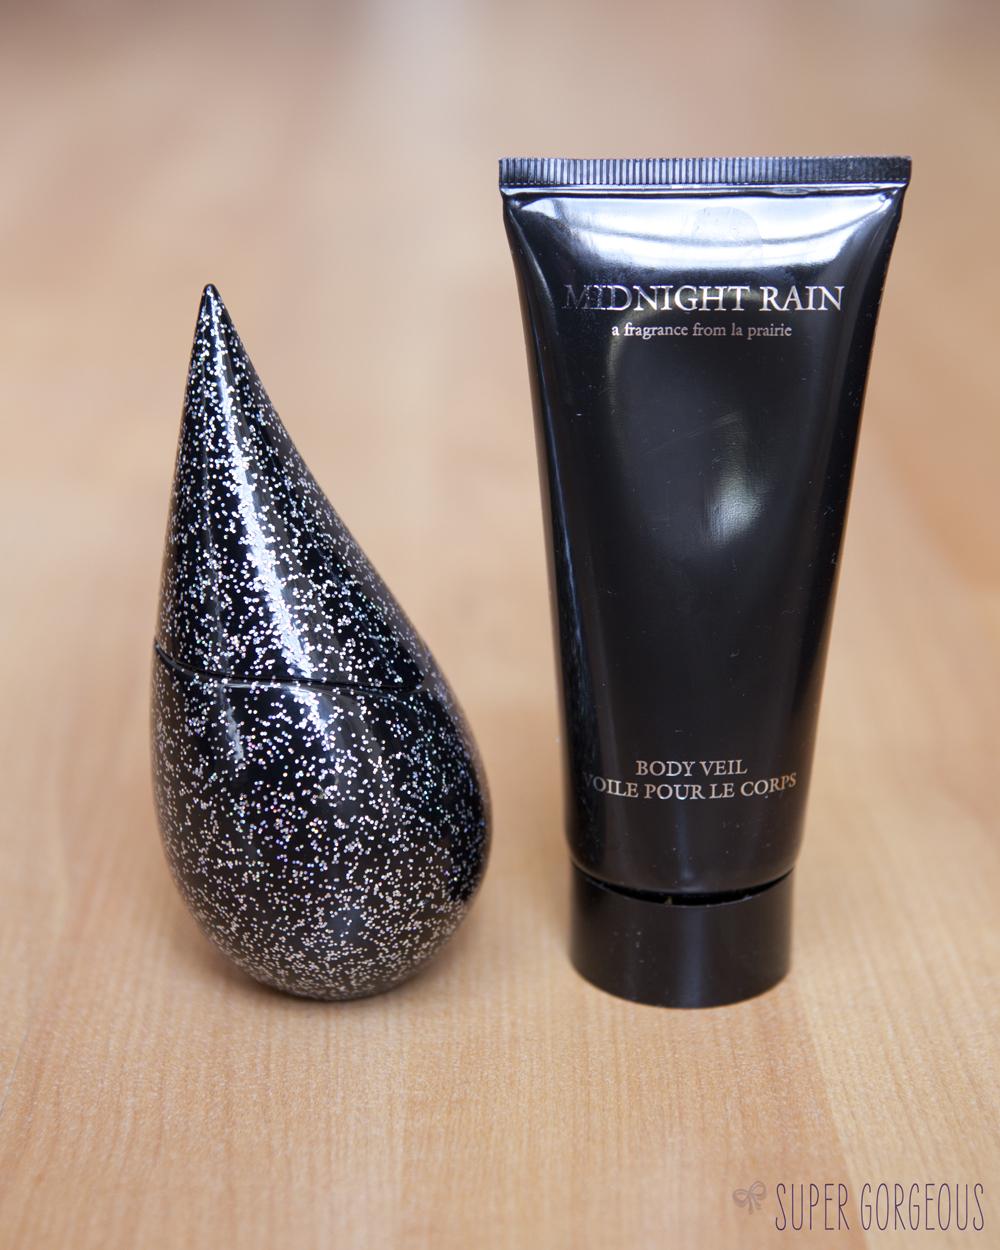 Perfume Silver Rain Perfume Shaped Like a Rain